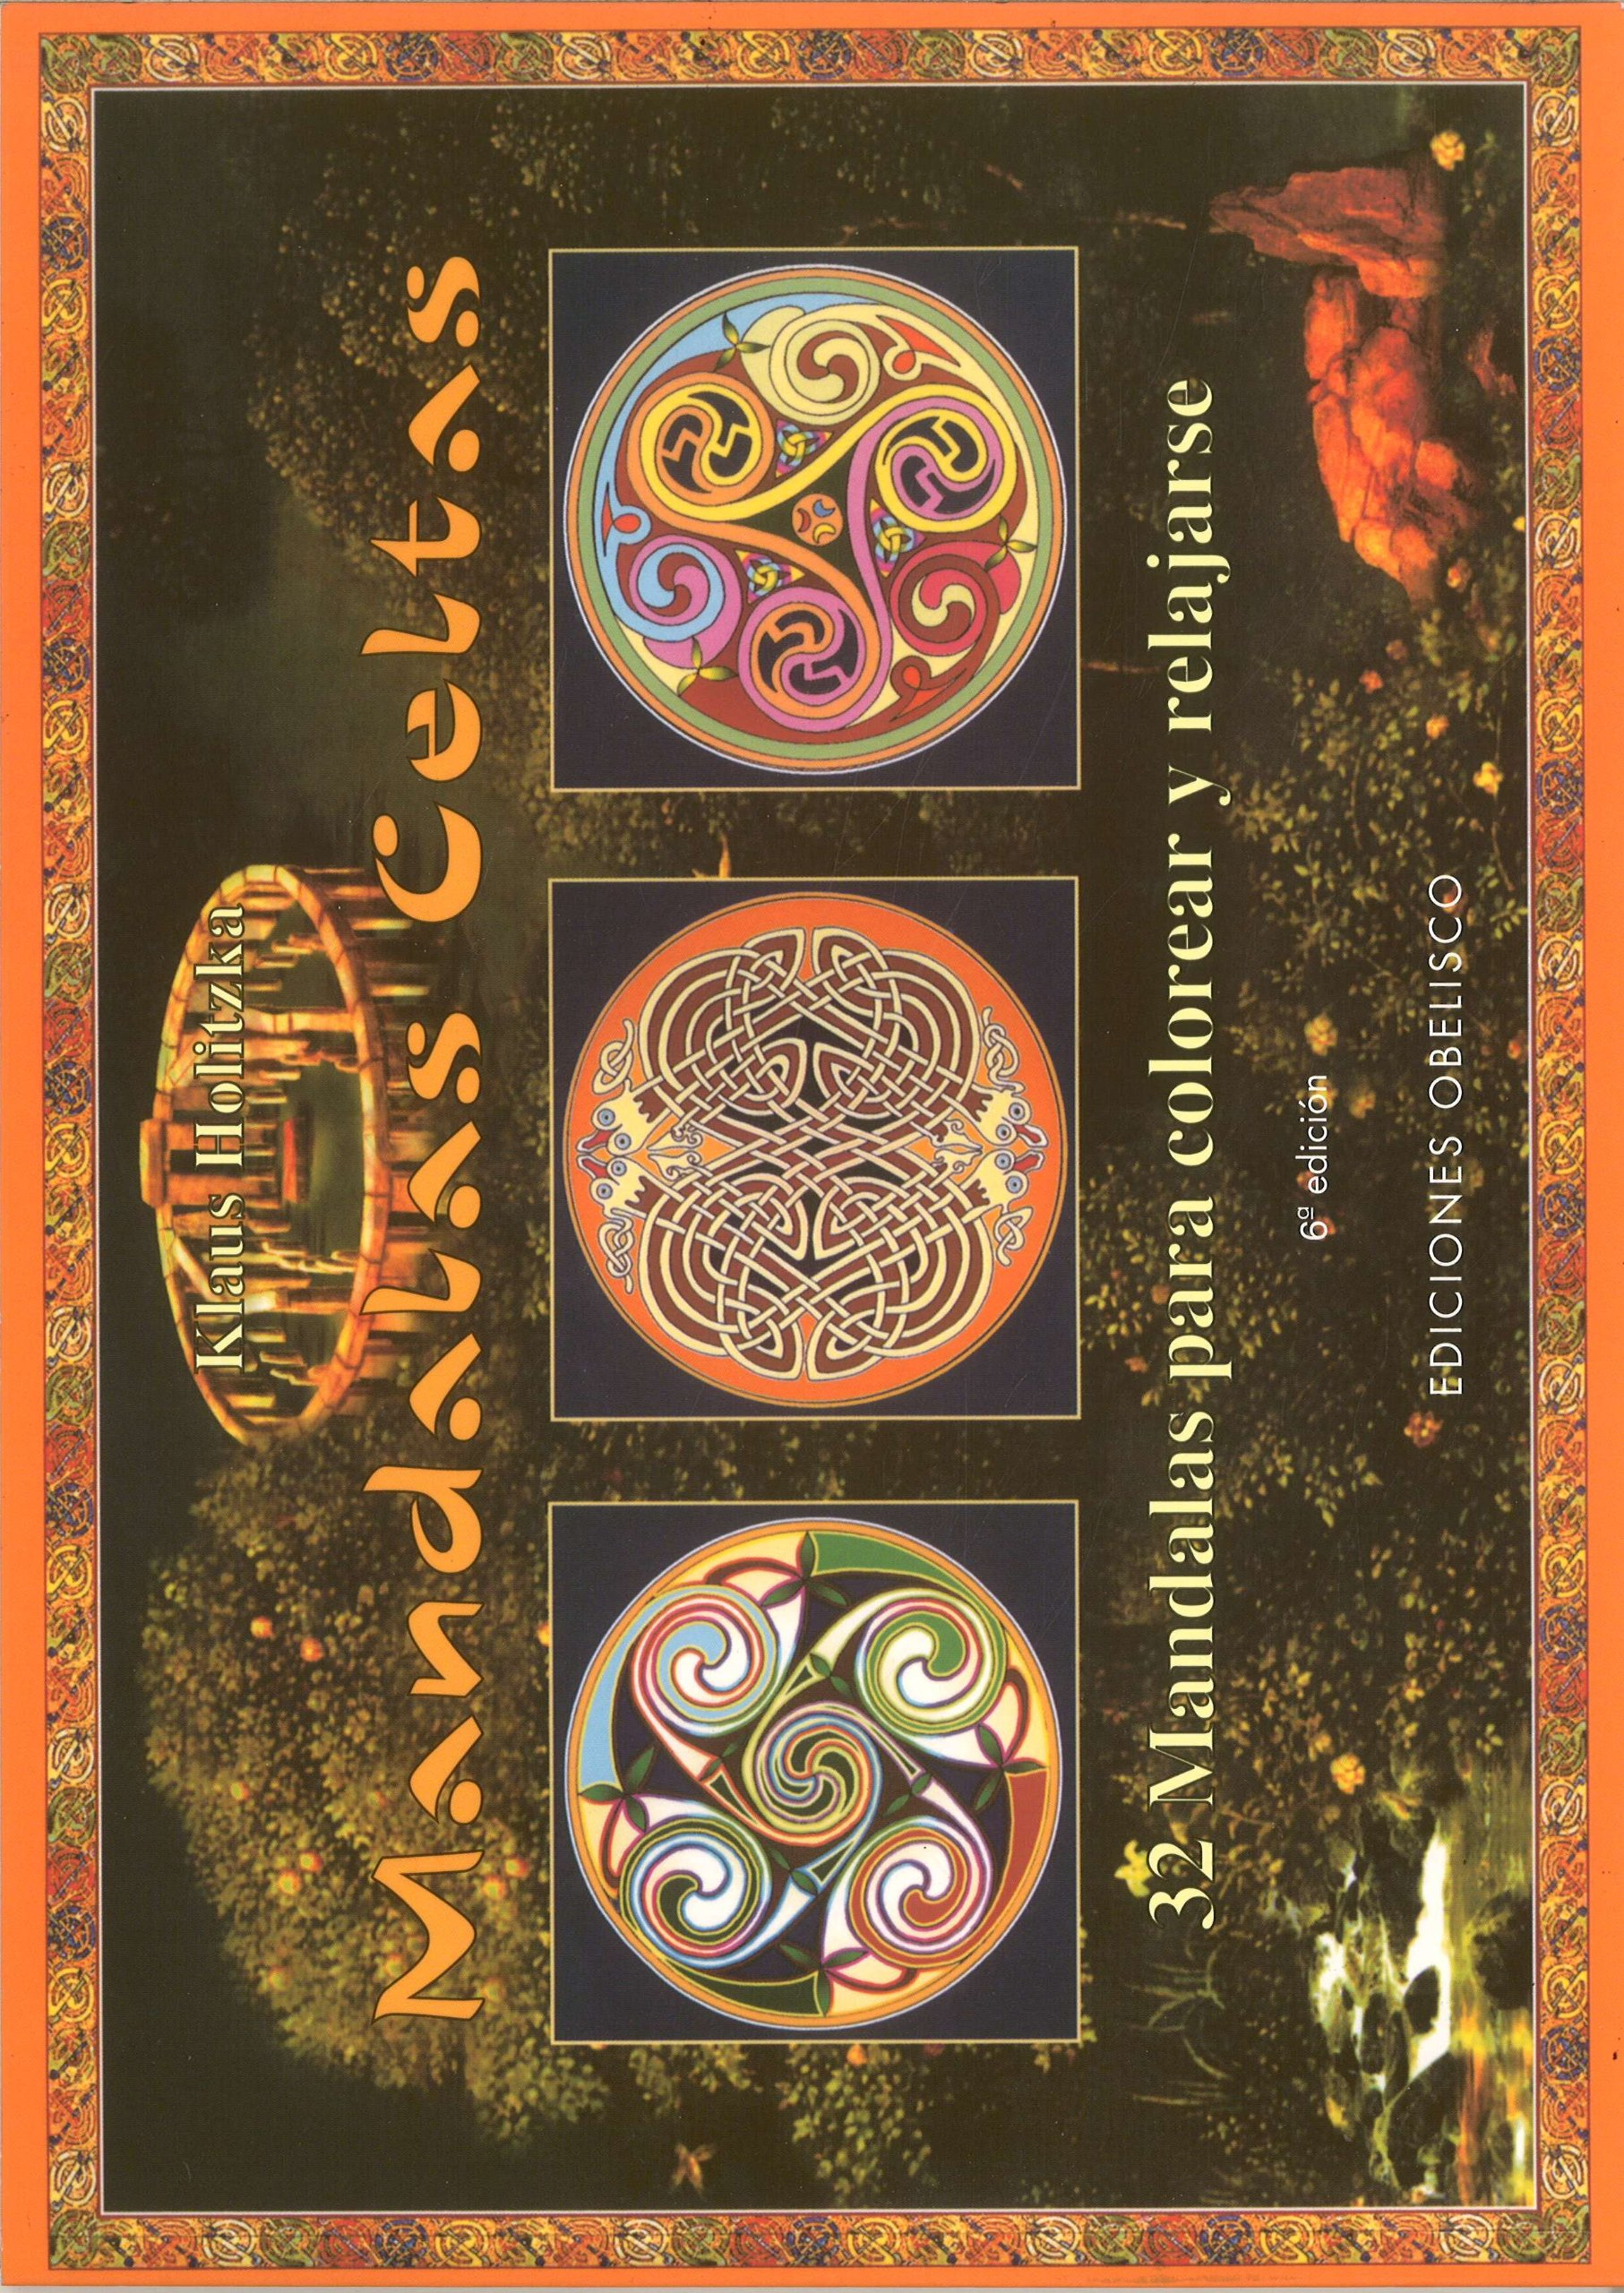 Mandalas celtas (LIBROS SINGULARES): Amazon.es: KLAUS HOLITZKA: Libros